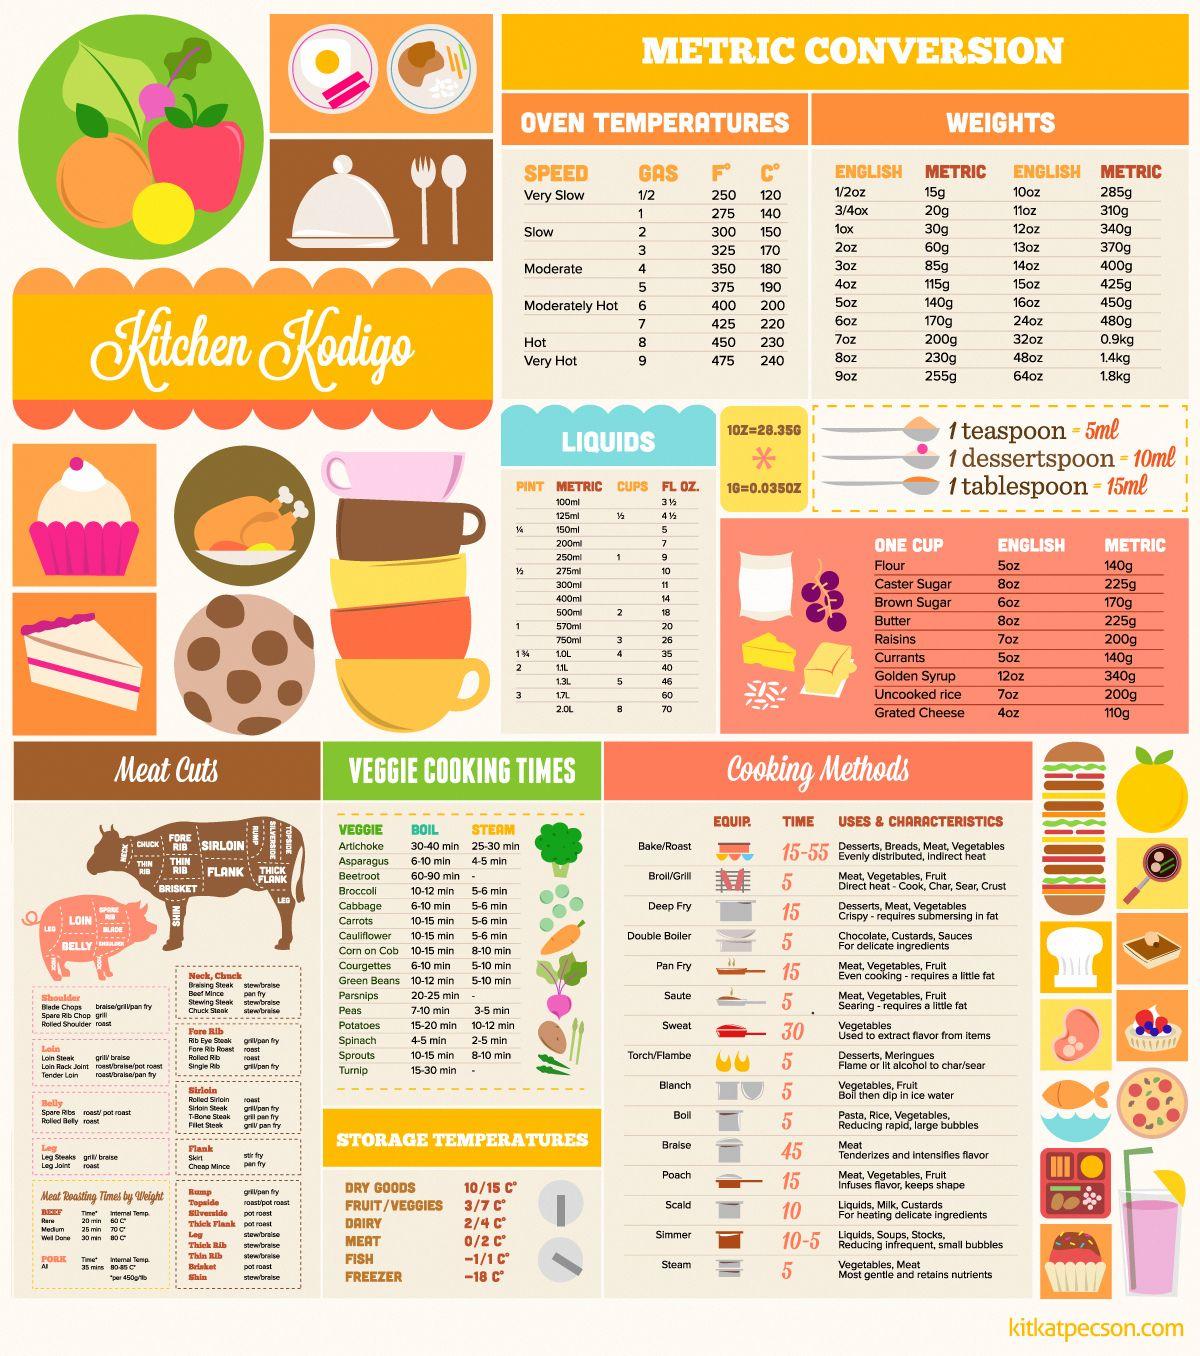 Cooking Metric Conversion Cheat Sheet Image Source